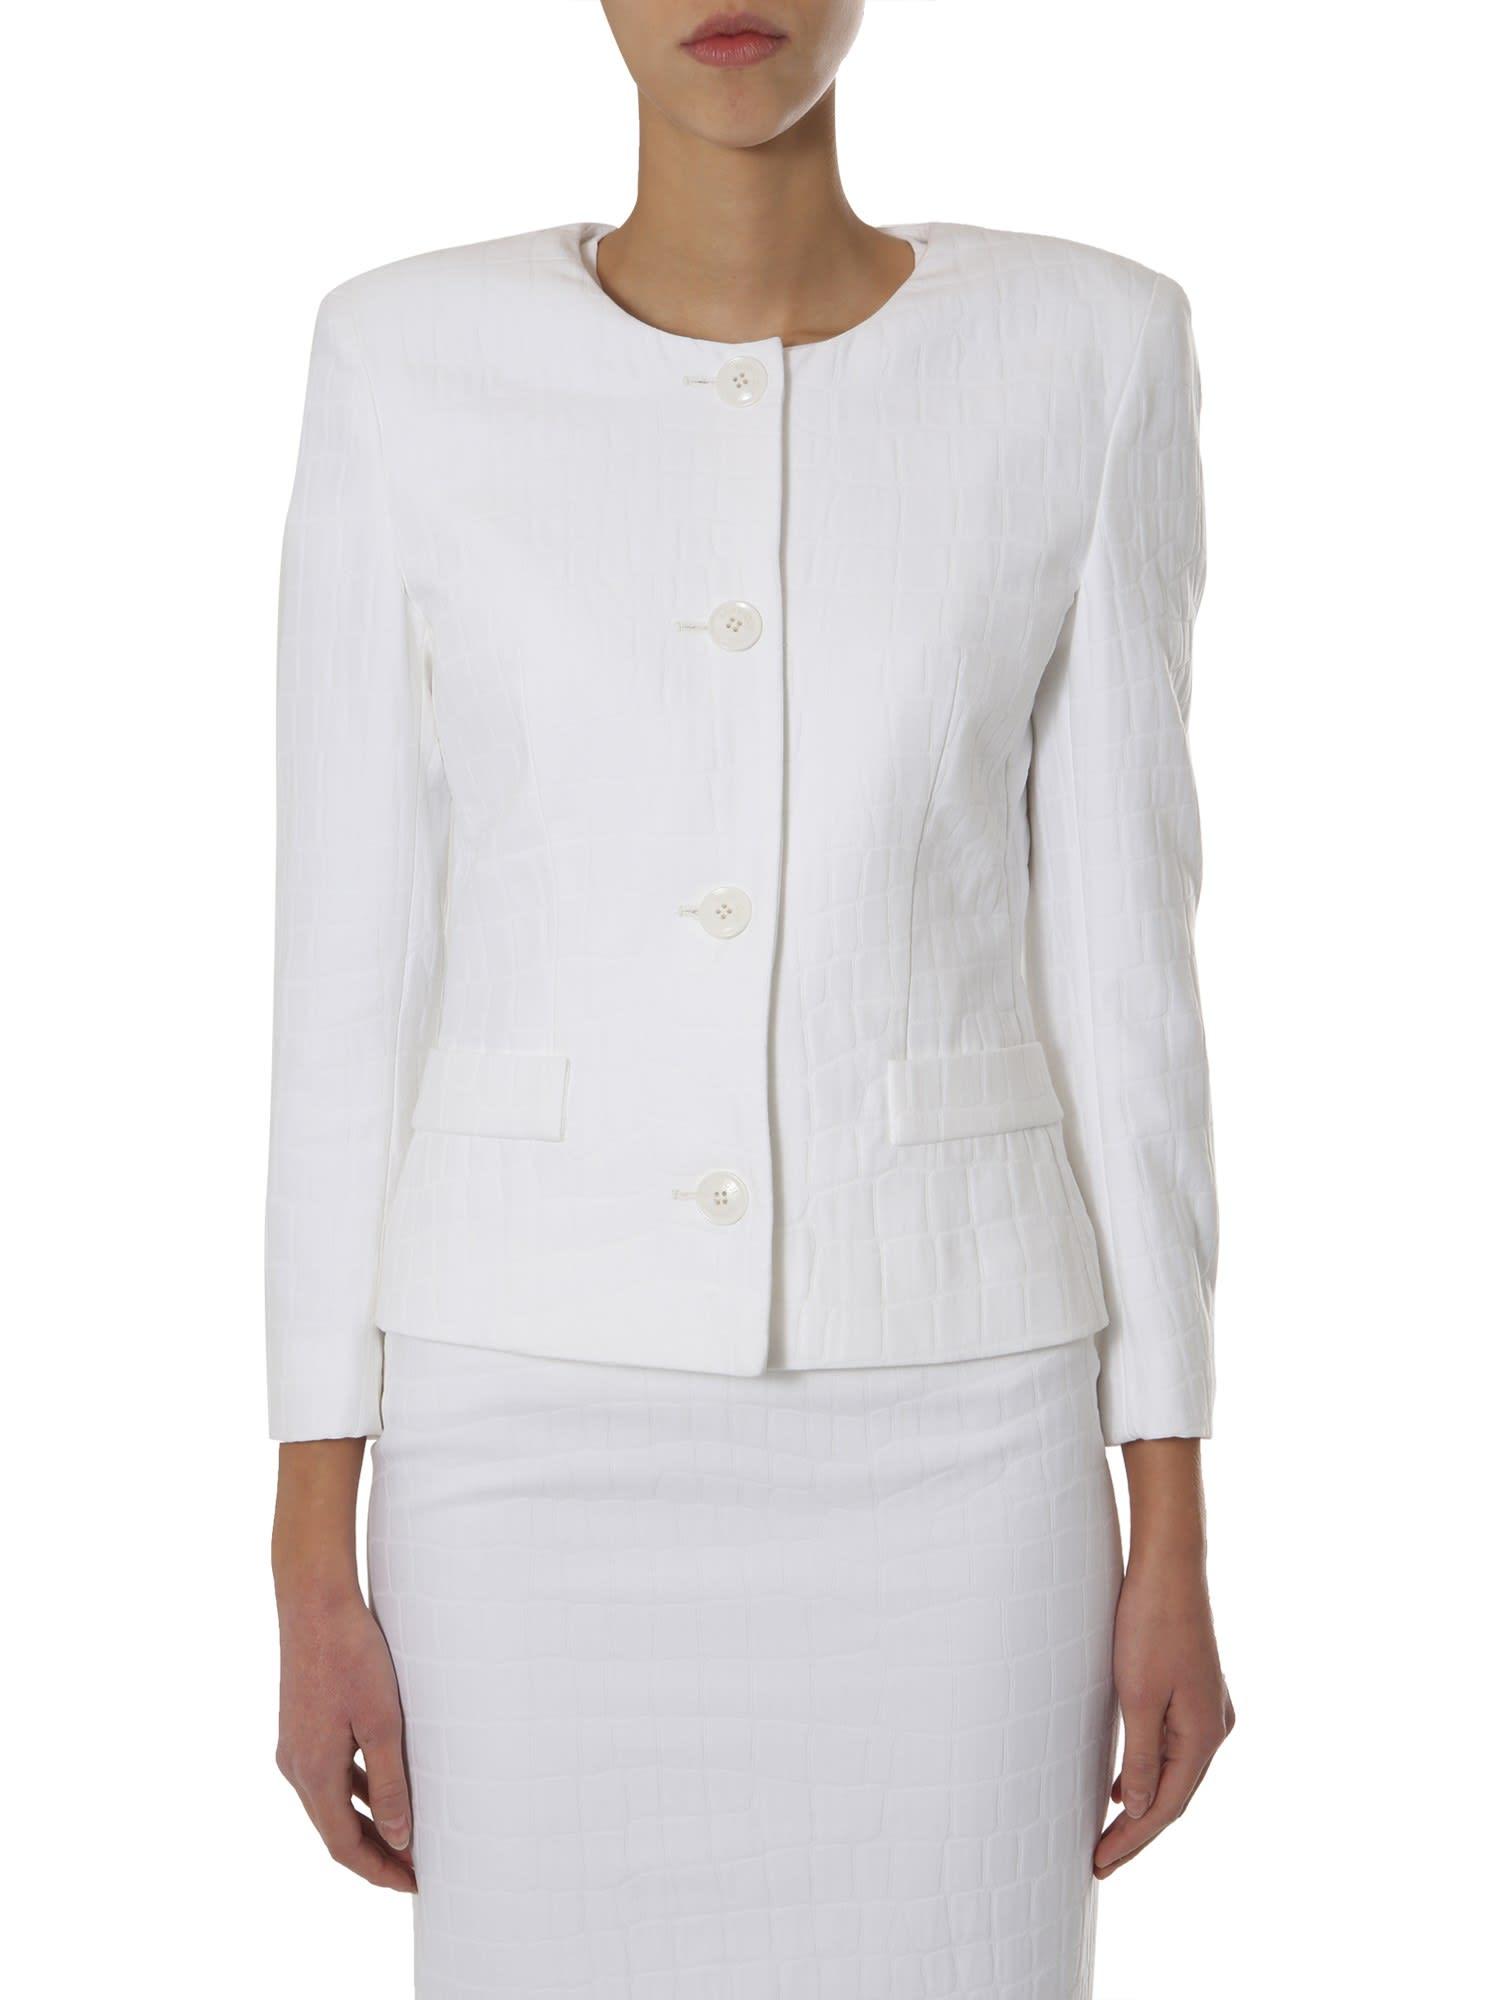 Boutique Moschino Cotton Jacket